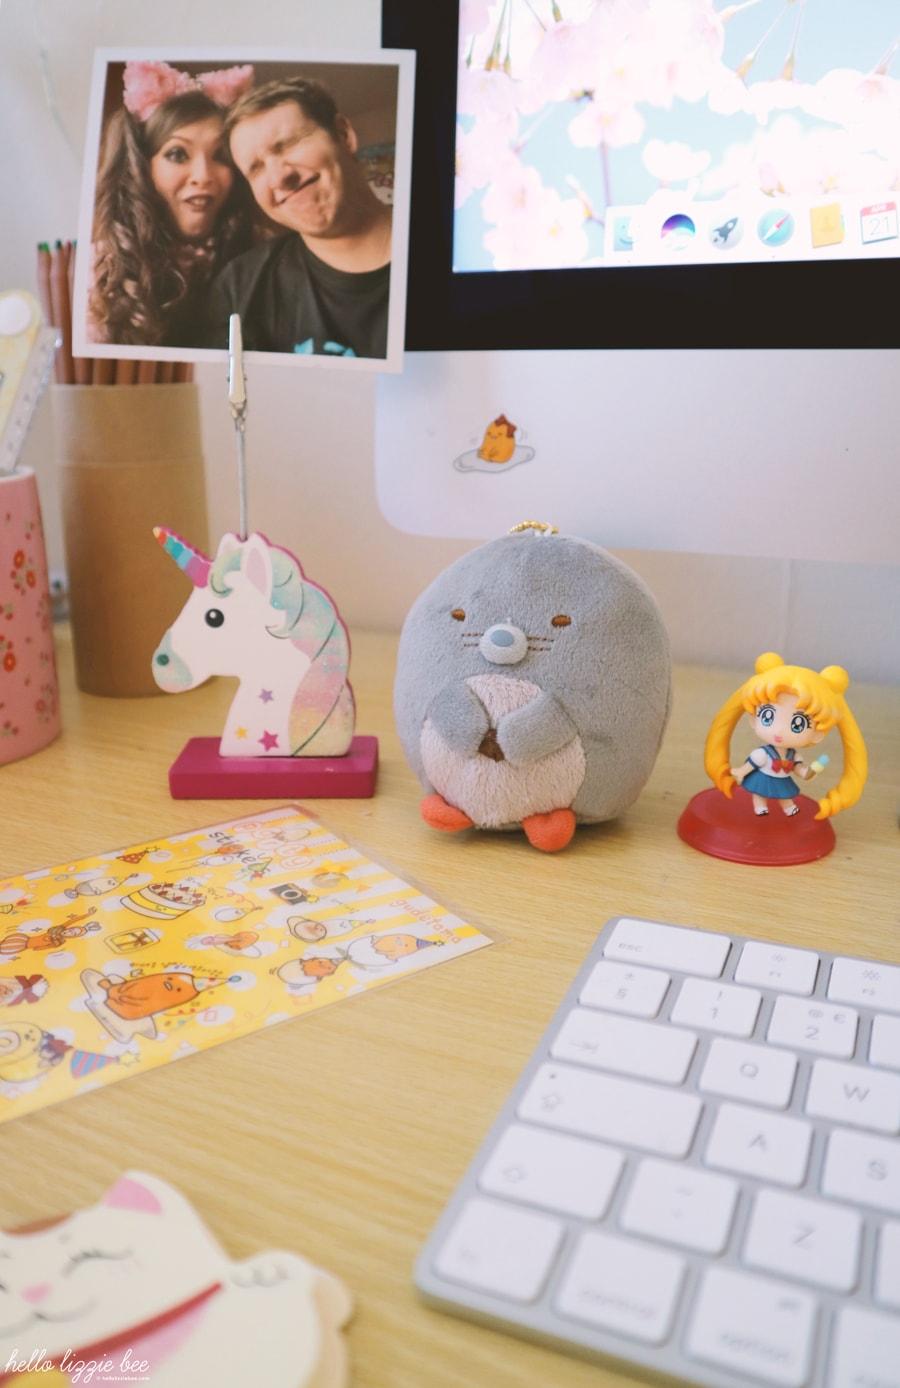 cute desk figurines